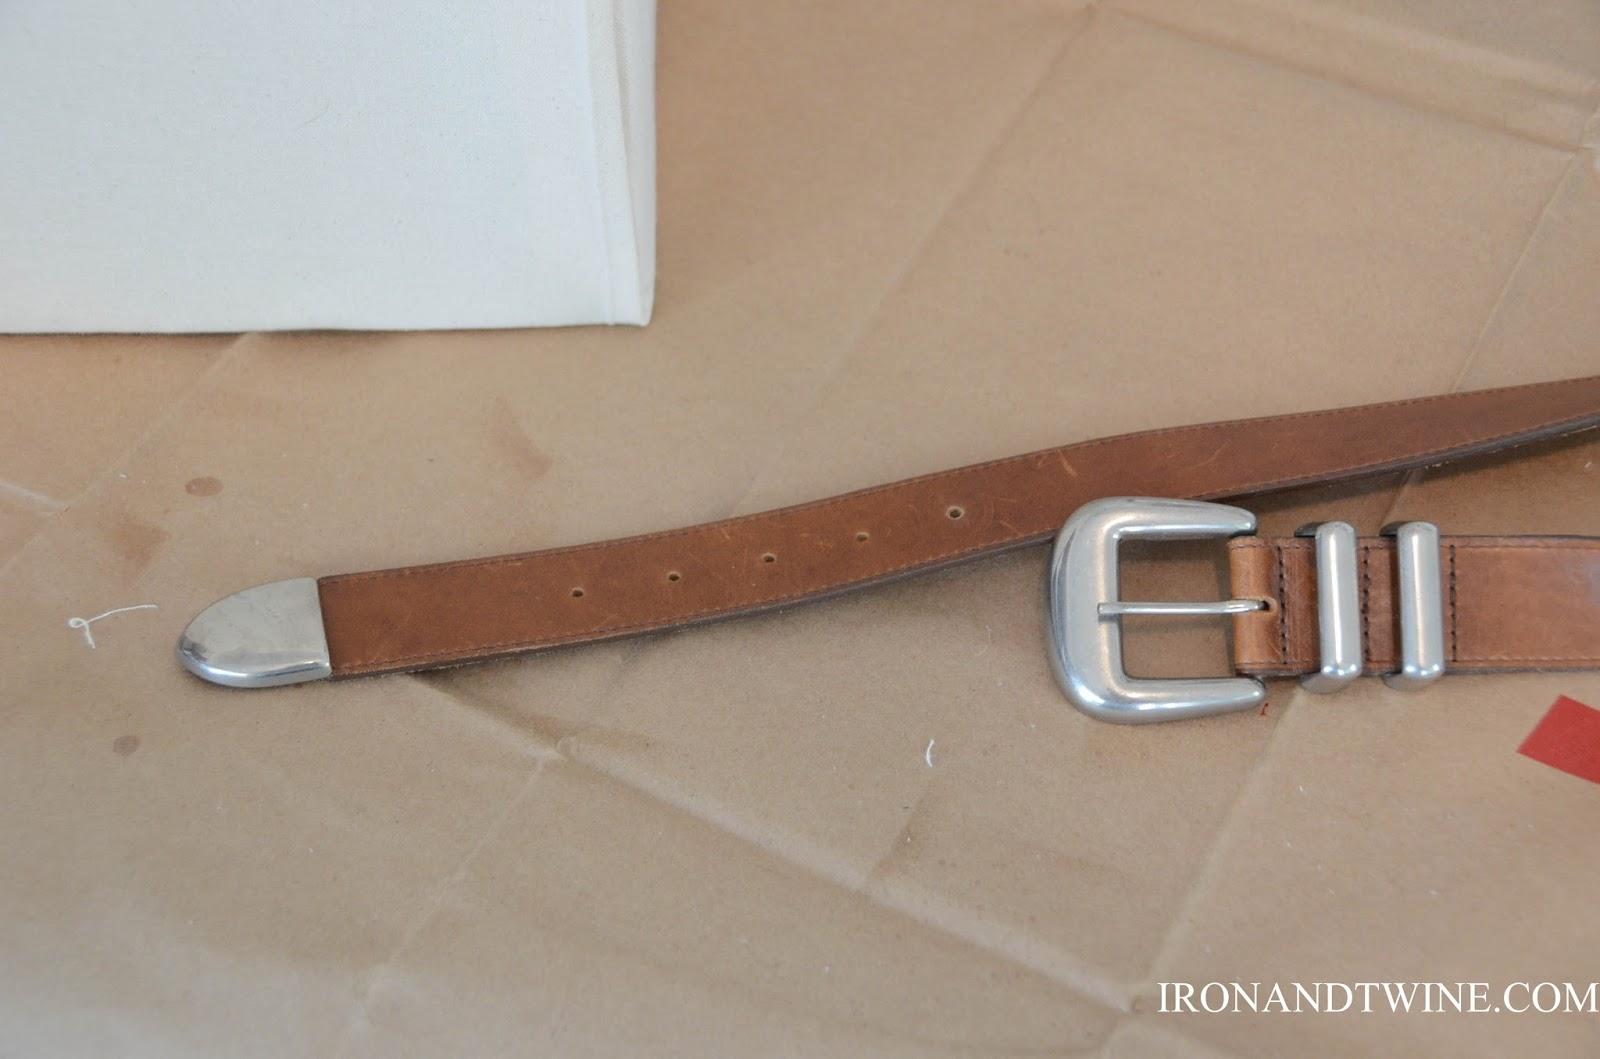 DIY+Belt+Handled+Box,+DIY+fabric+covered+box,+Iron+and+Twine+(32).jpg